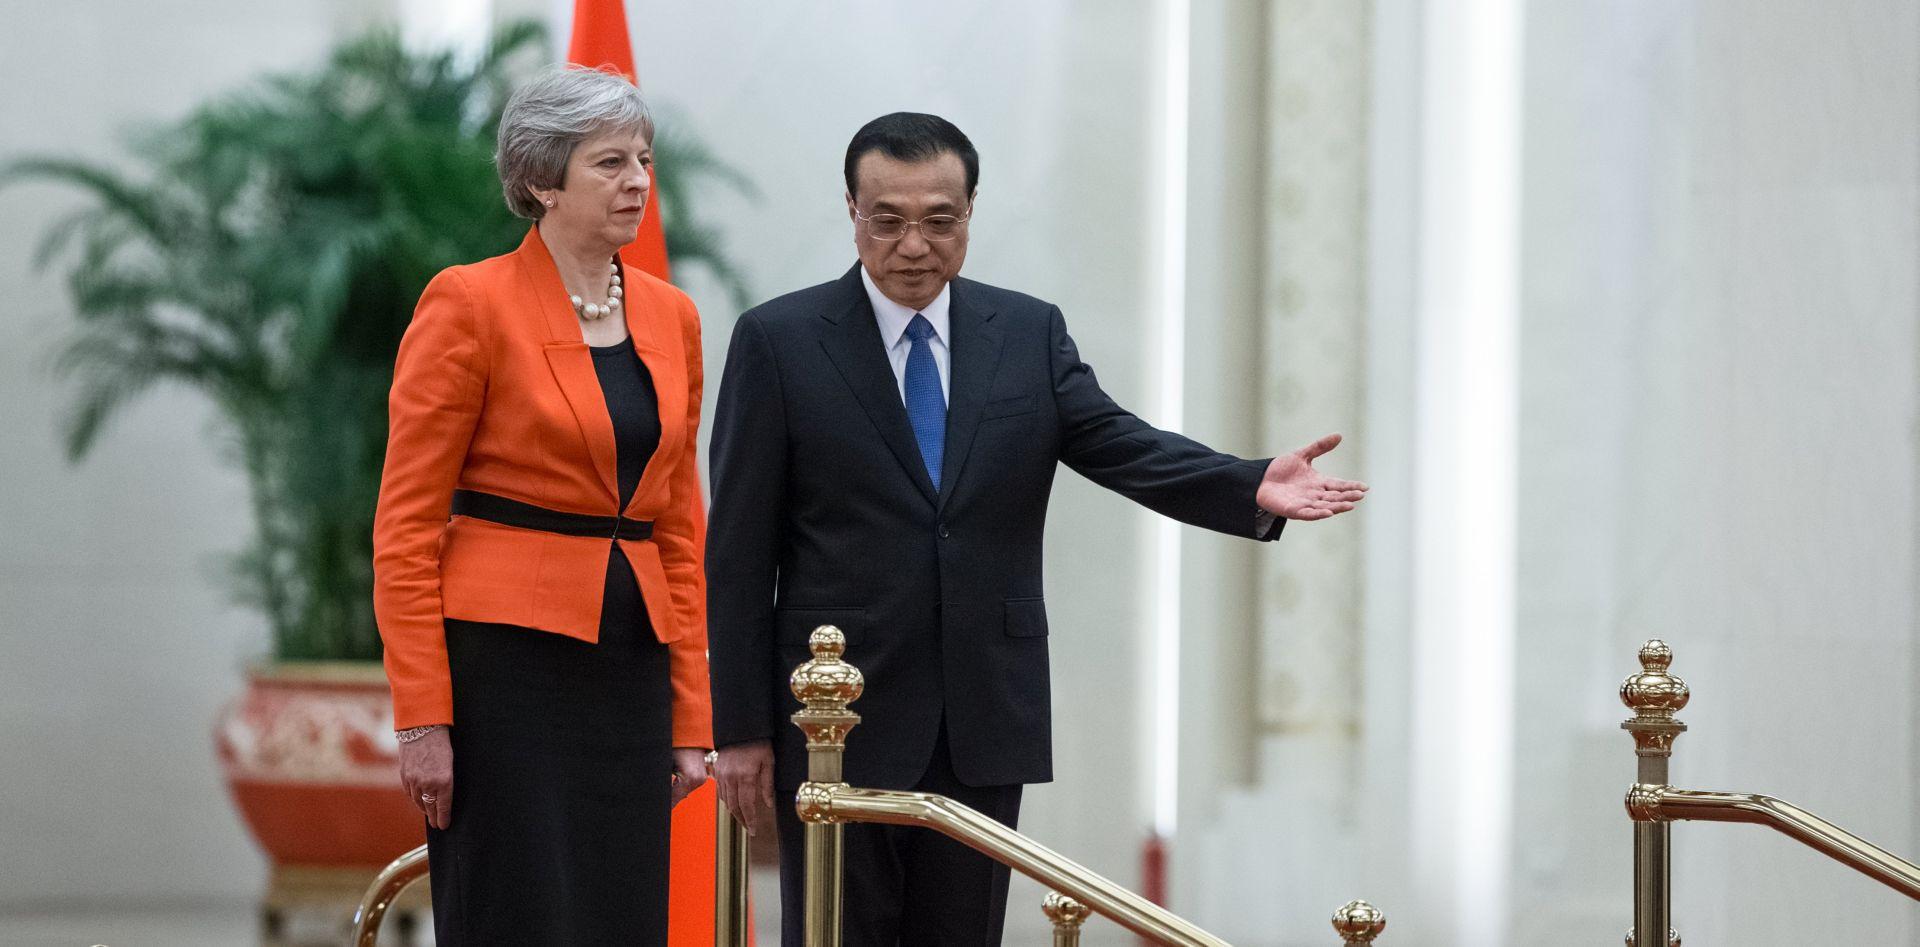 Theresa May doputovala u službeni posjet Kini